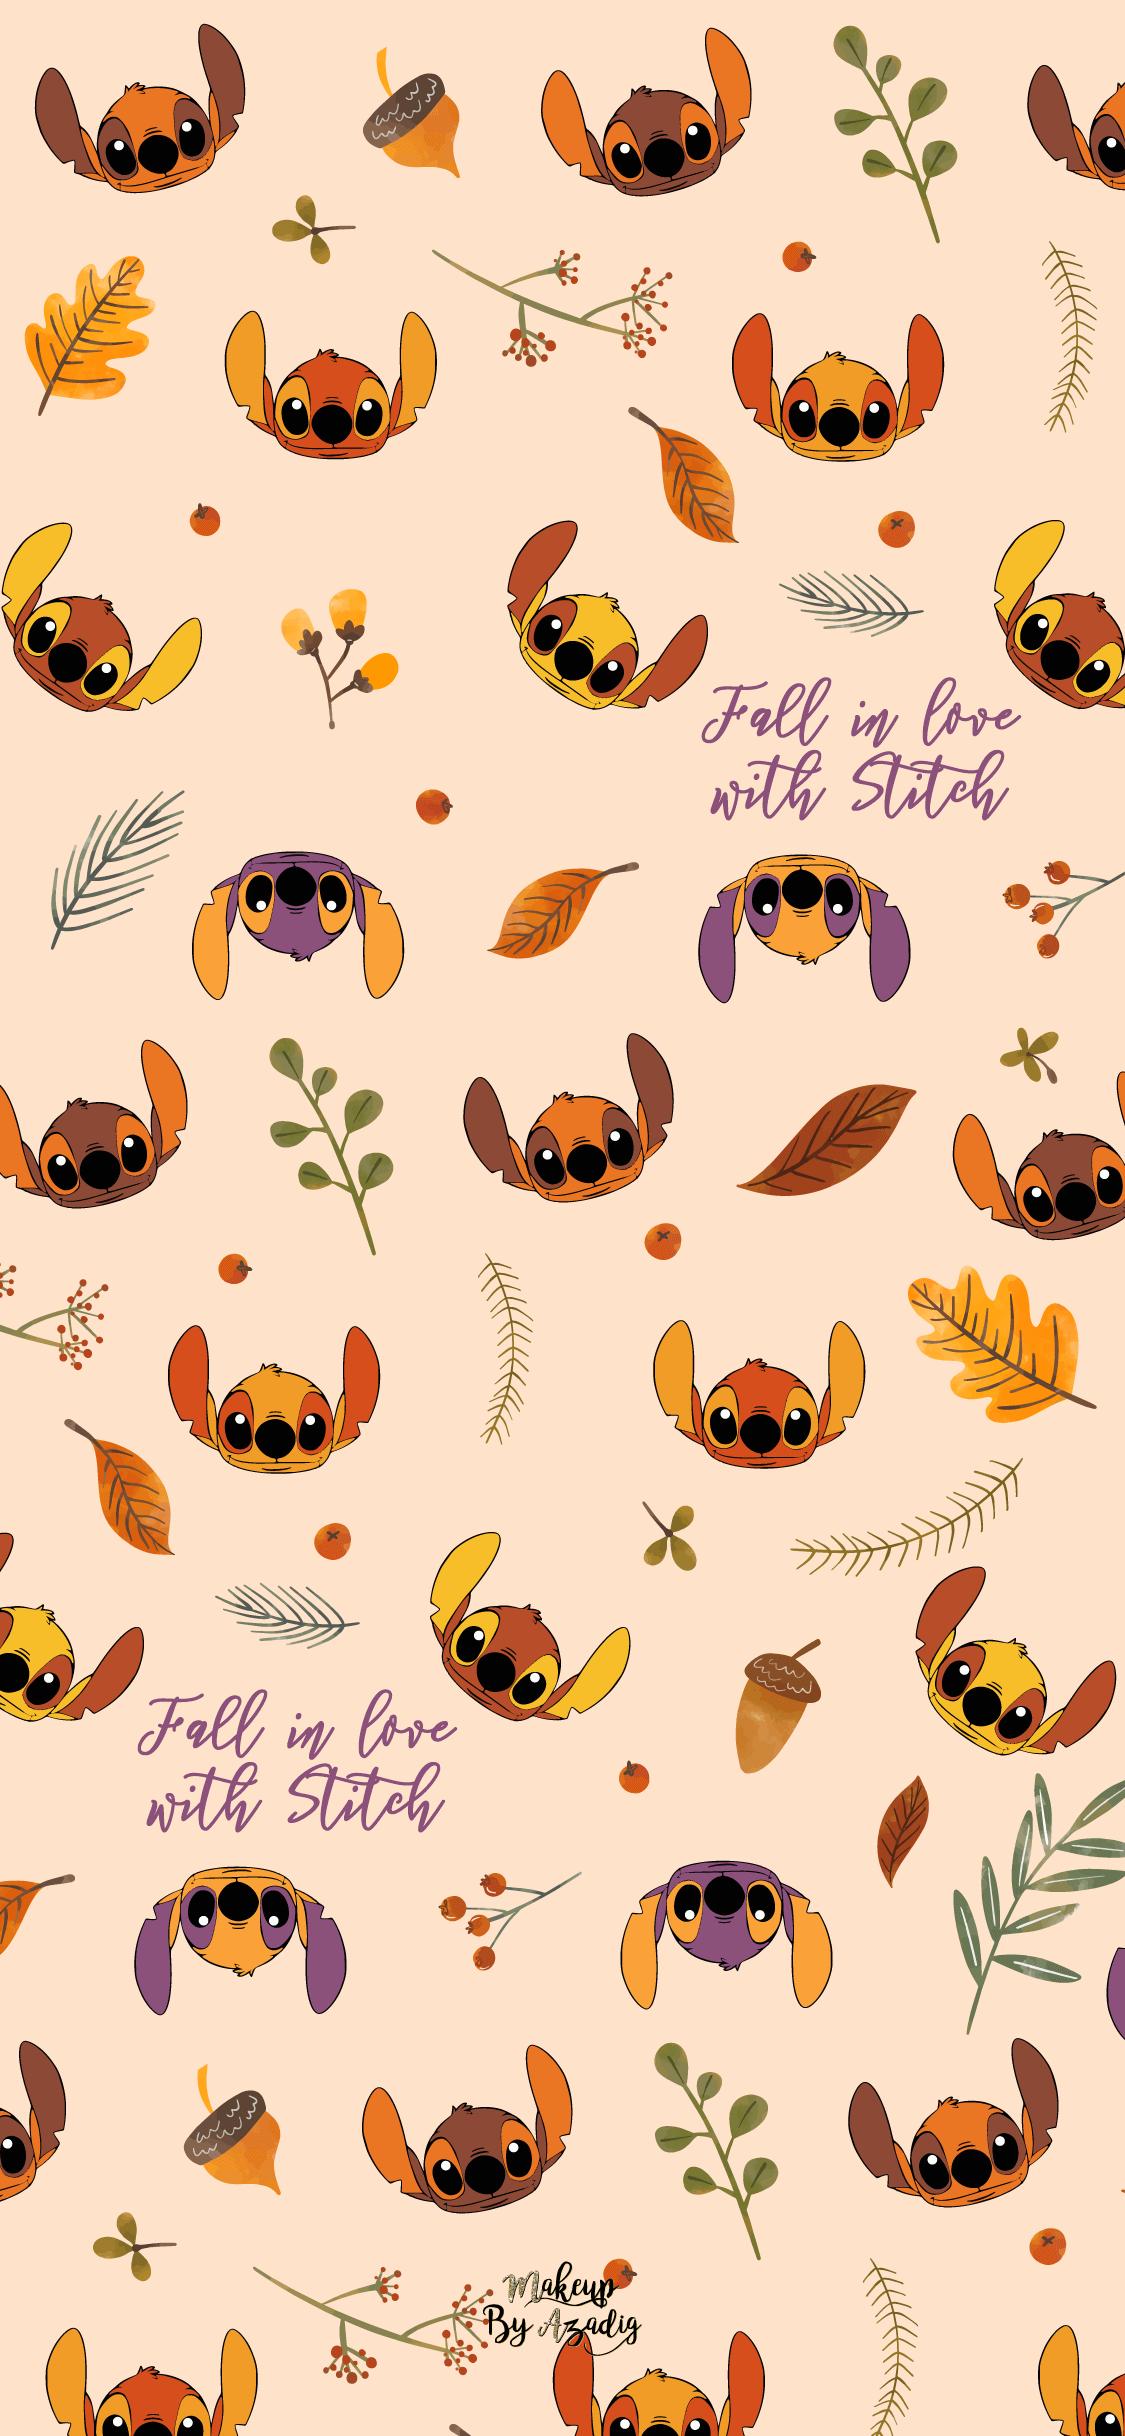 fond-decran-wallpaper-stitch-autumn-automne-fallinlove-disney-iphone-X-makeupbyazadig-tendance